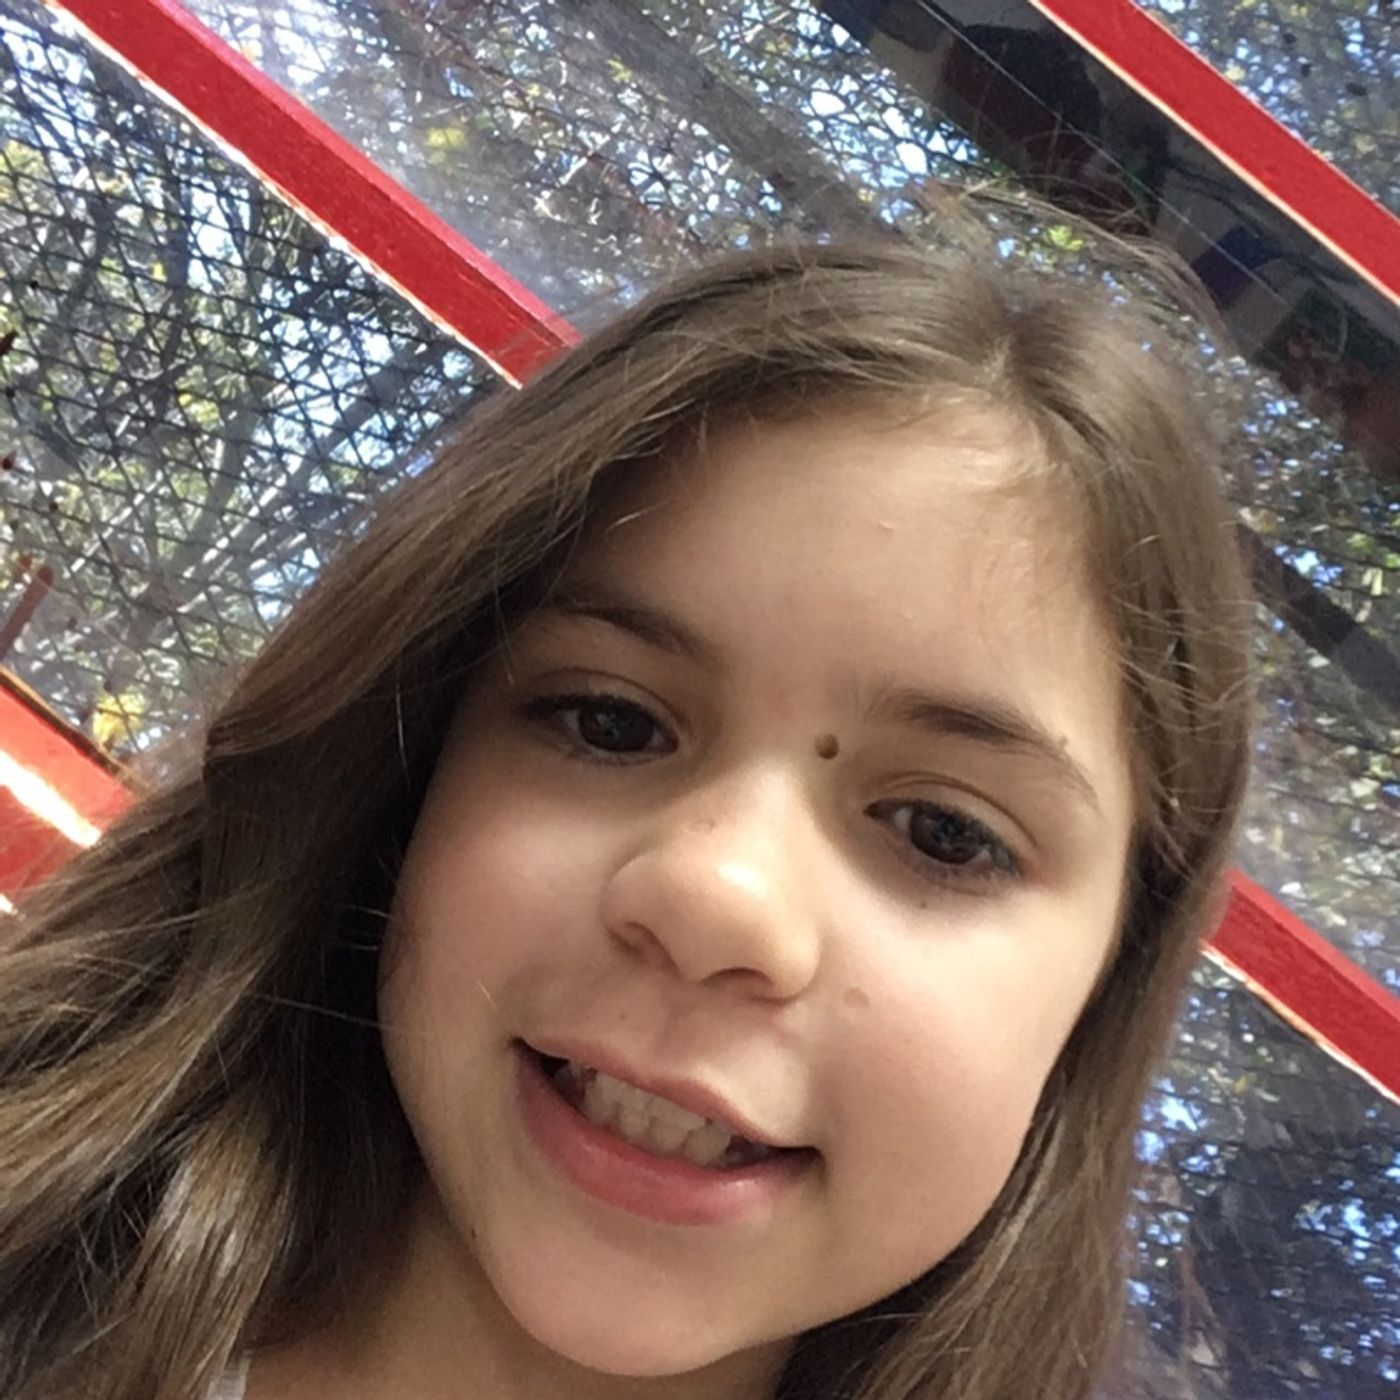 Isabelly Rocha - Quem Sou Eu 4° ano